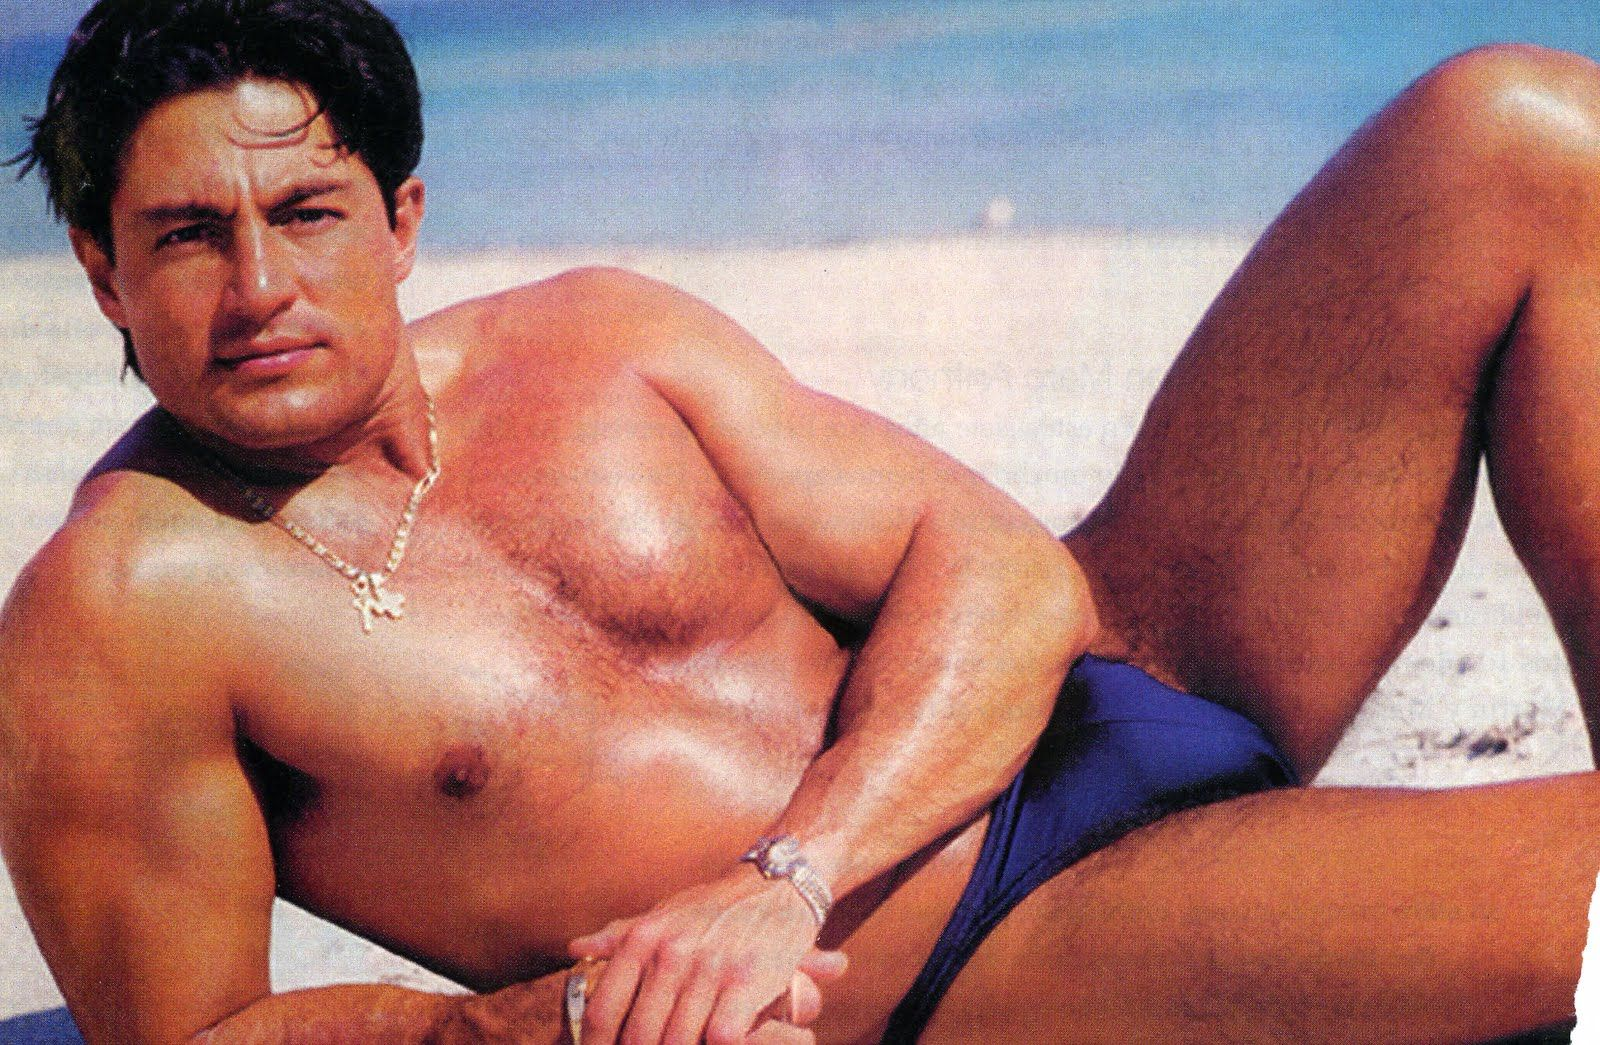 Fernando colunga naked free